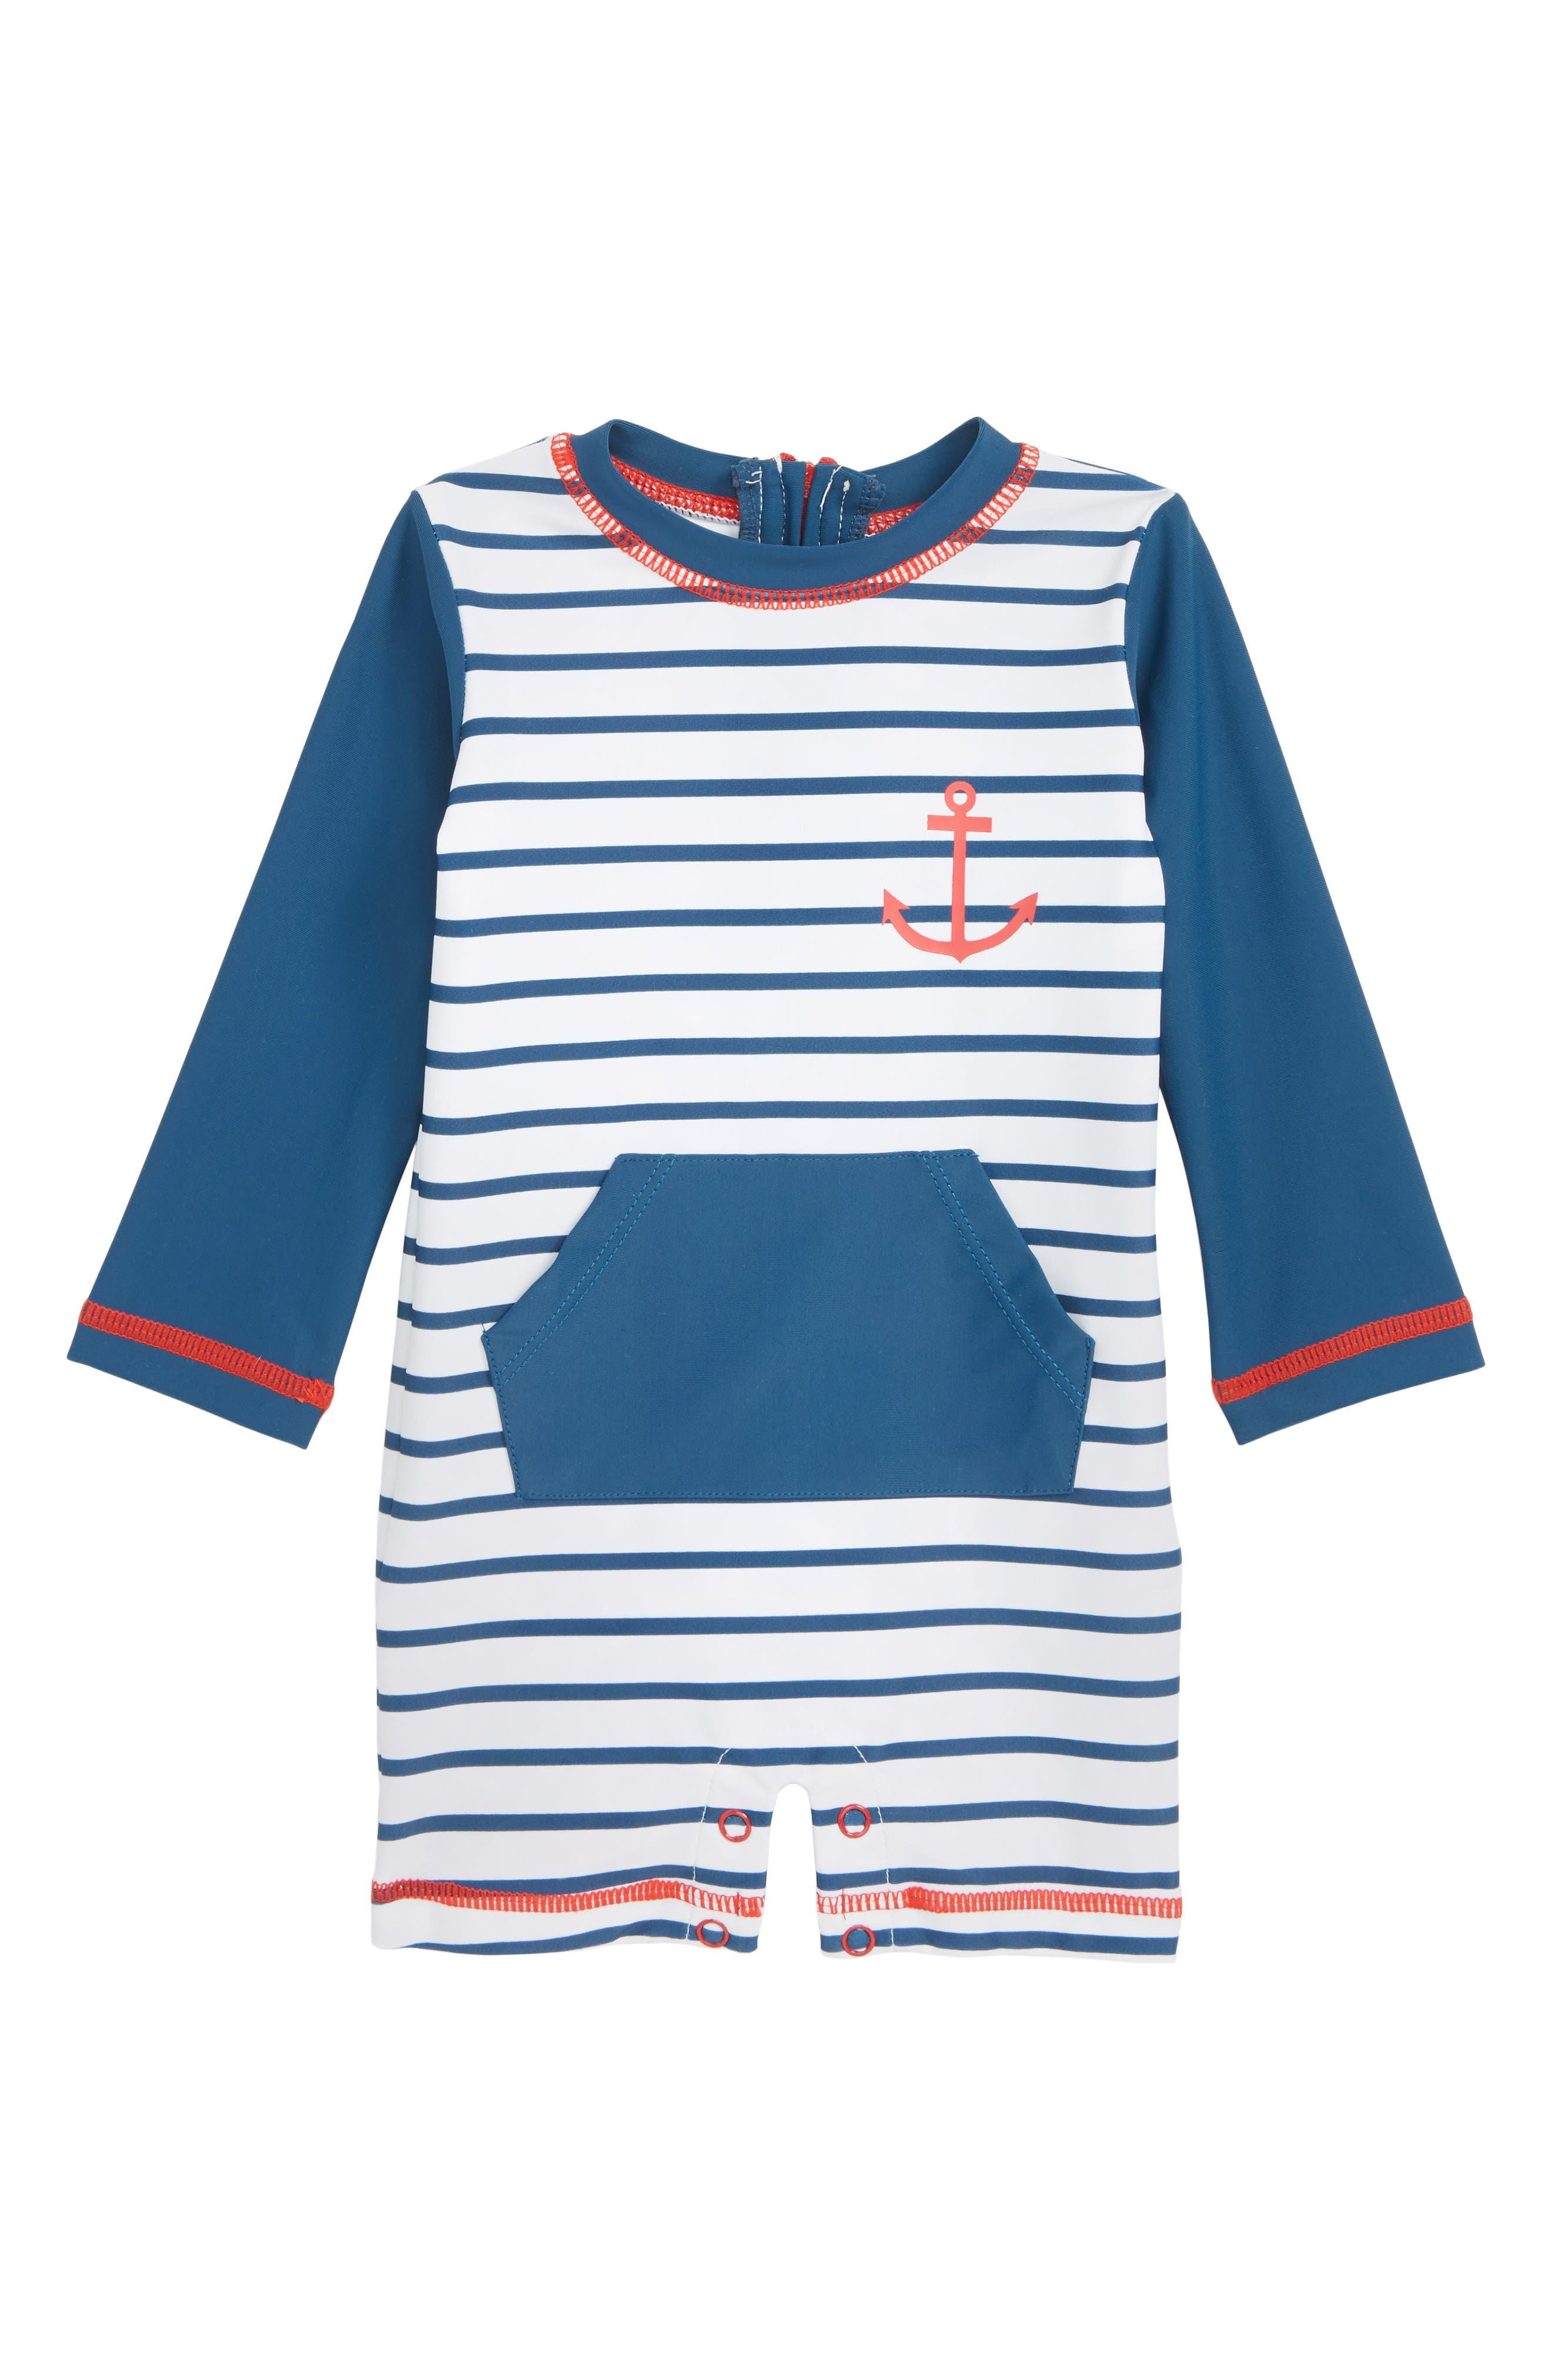 HATLEY, Nautical Stripes One-Piece Rashguard Swimsuit, Main thumbnail 1, color, 100